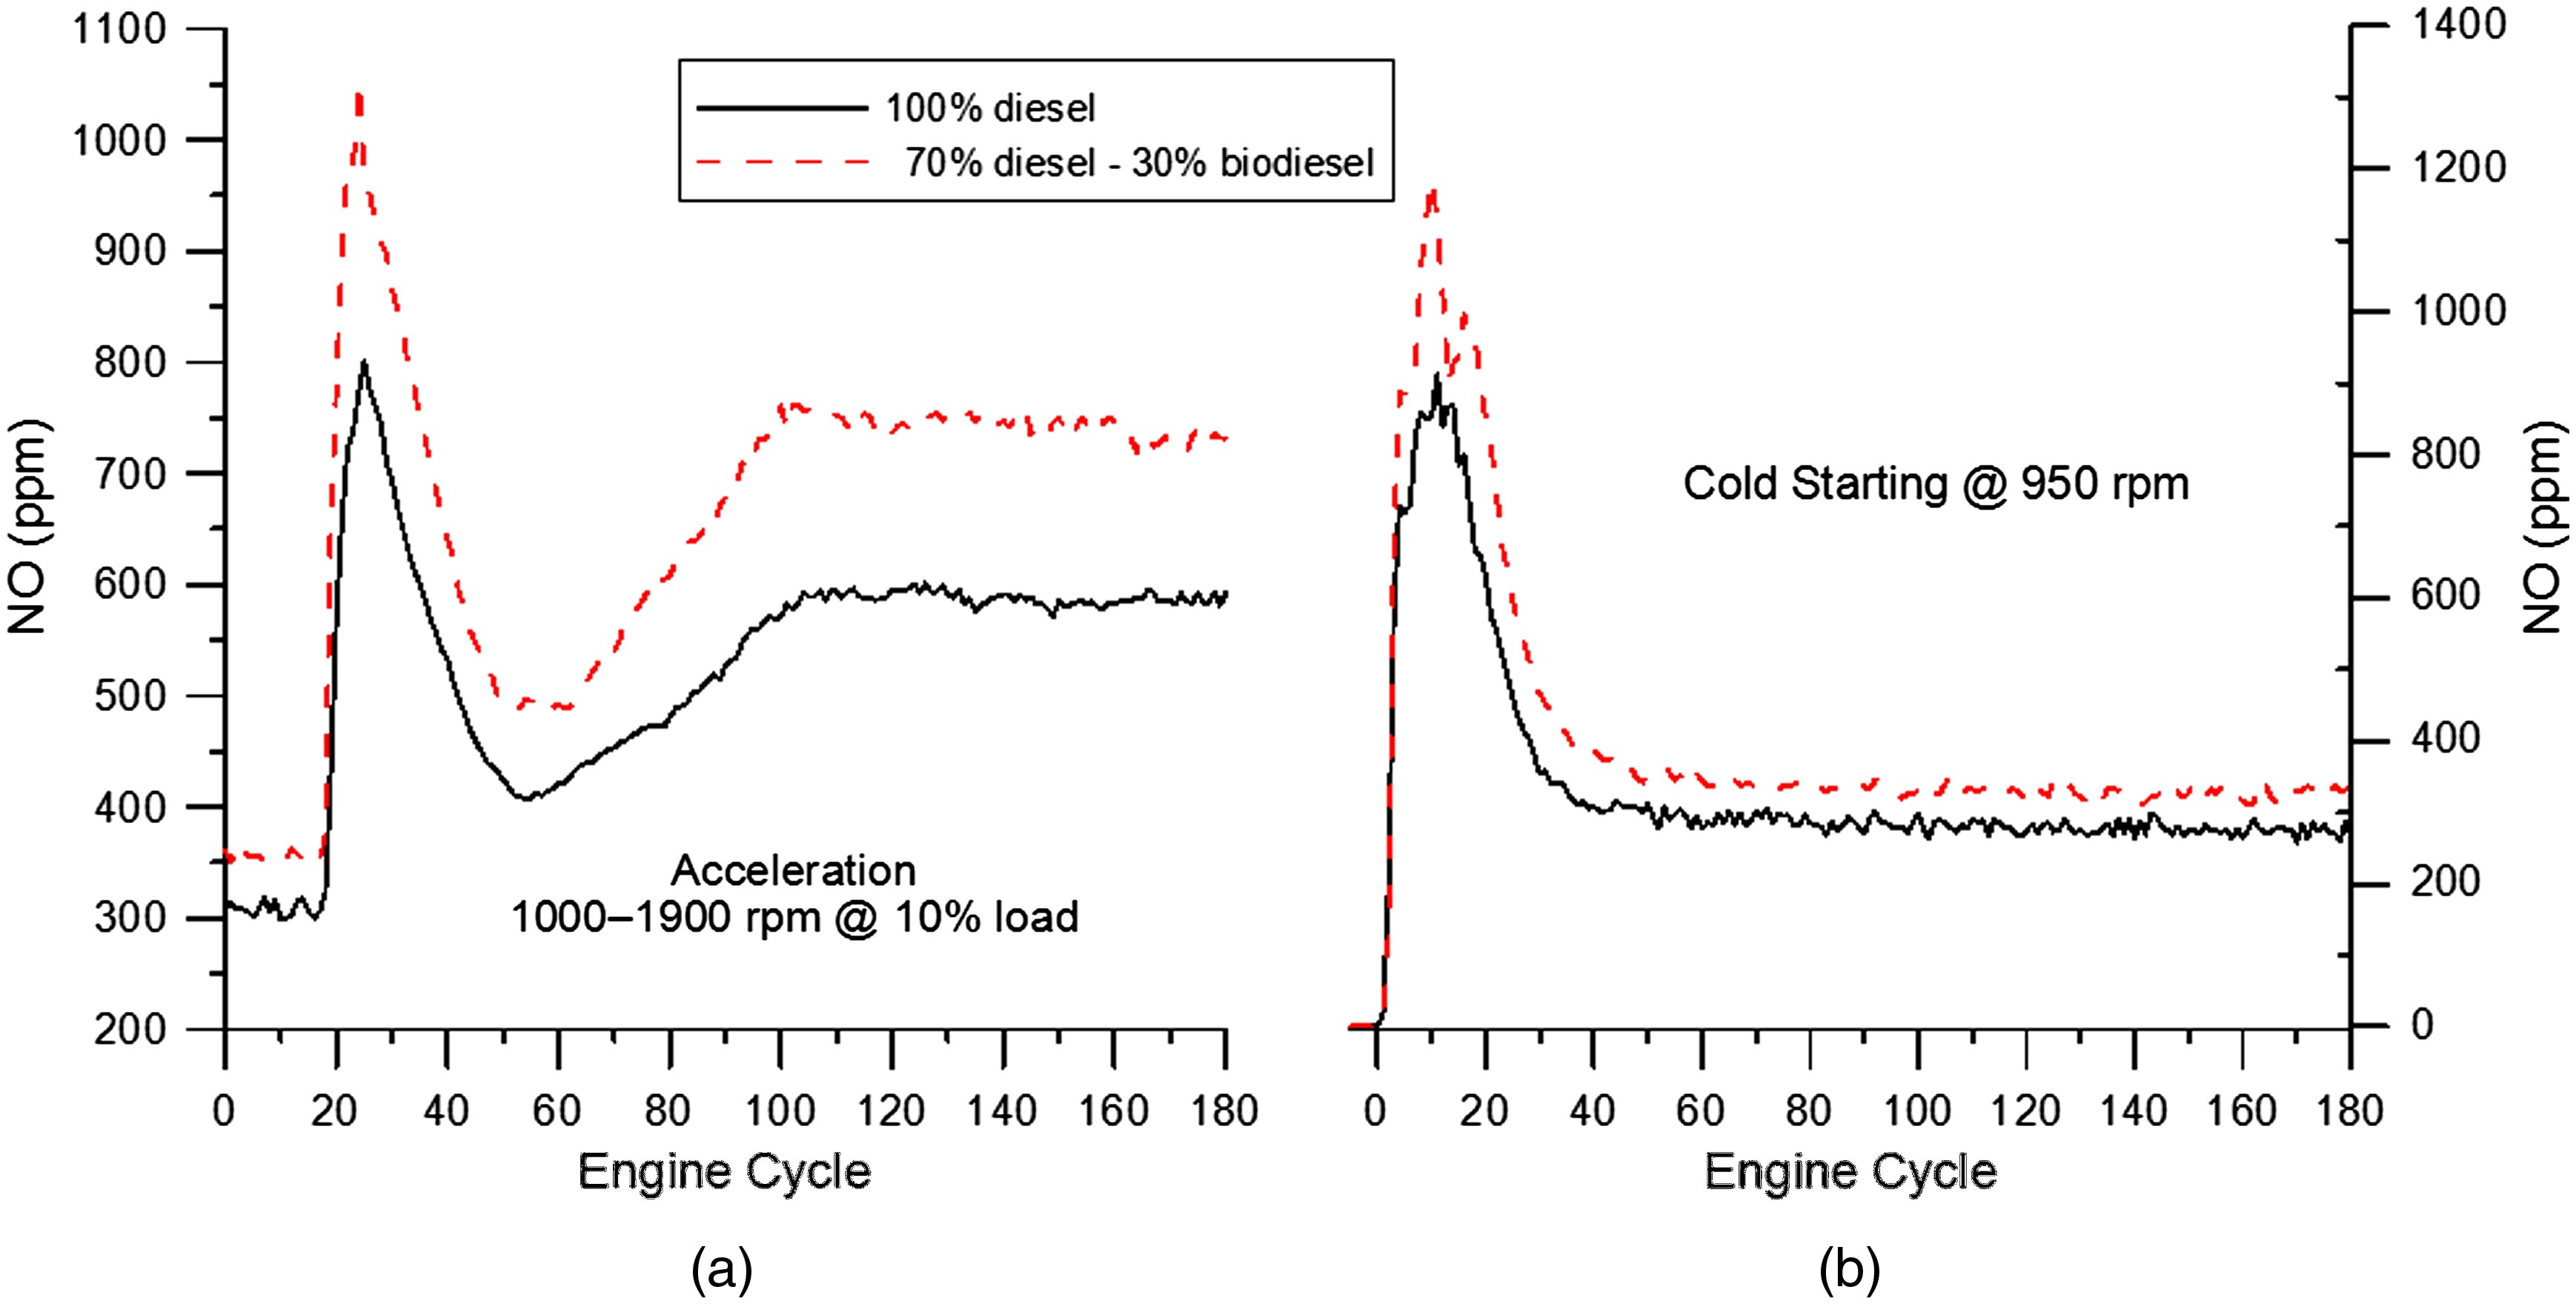 4 Stroke Petrol Engine Pv Diagram assessment Of Nox Emissions During Transient Diesel Engine Operation Of 4 Stroke Petrol Engine Pv Diagram